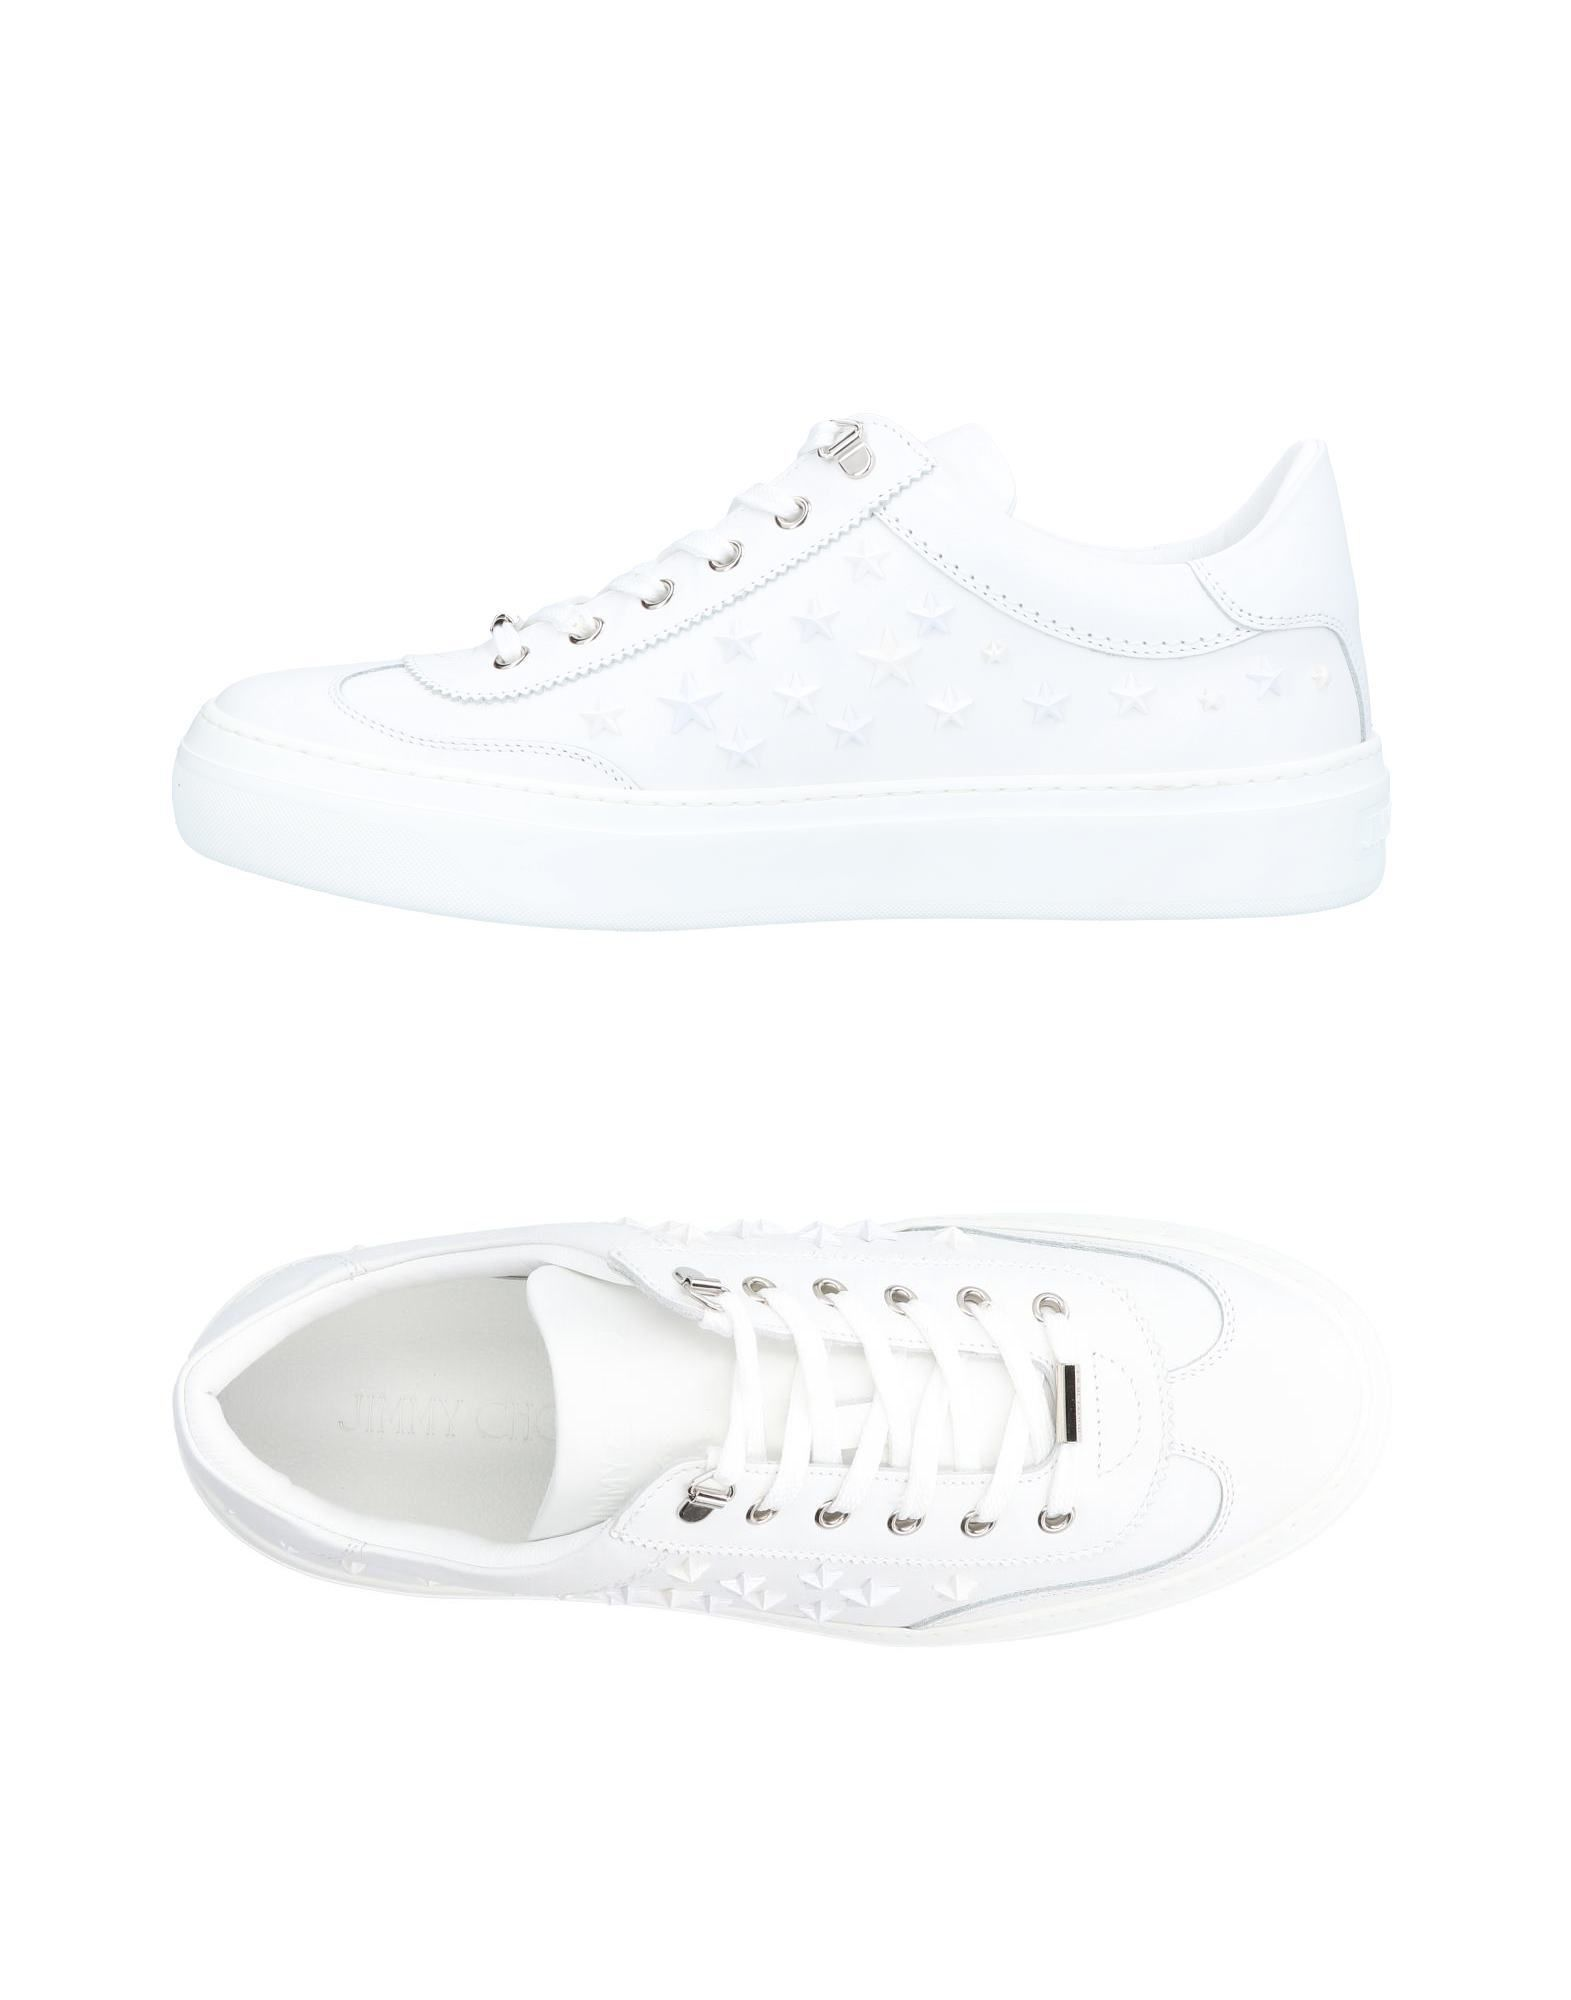 Jimmy Choo Sneakers Herren  11463689JG Gute Qualität beliebte Schuhe